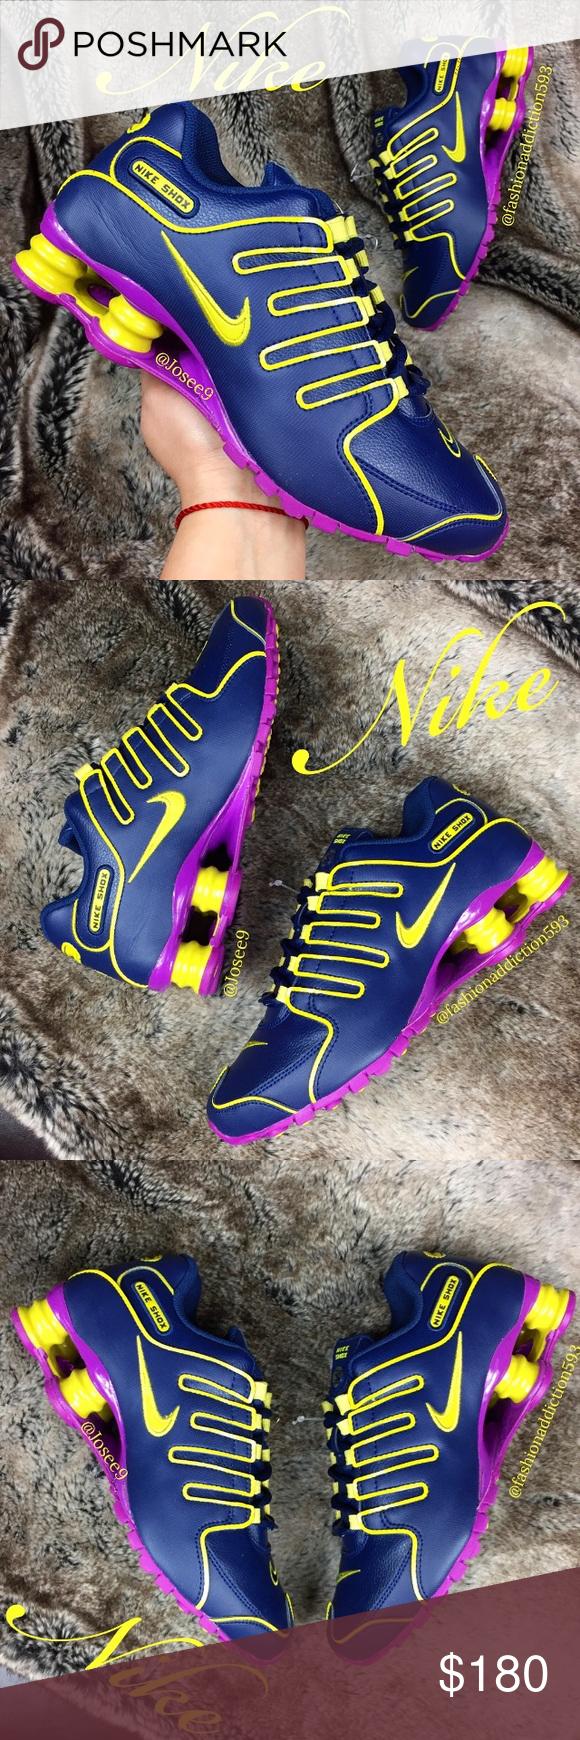 1972845897f7 Nike SHOX NZ Women s Navy Blue purple yellow shoes •Brand new •Authentic  •Box